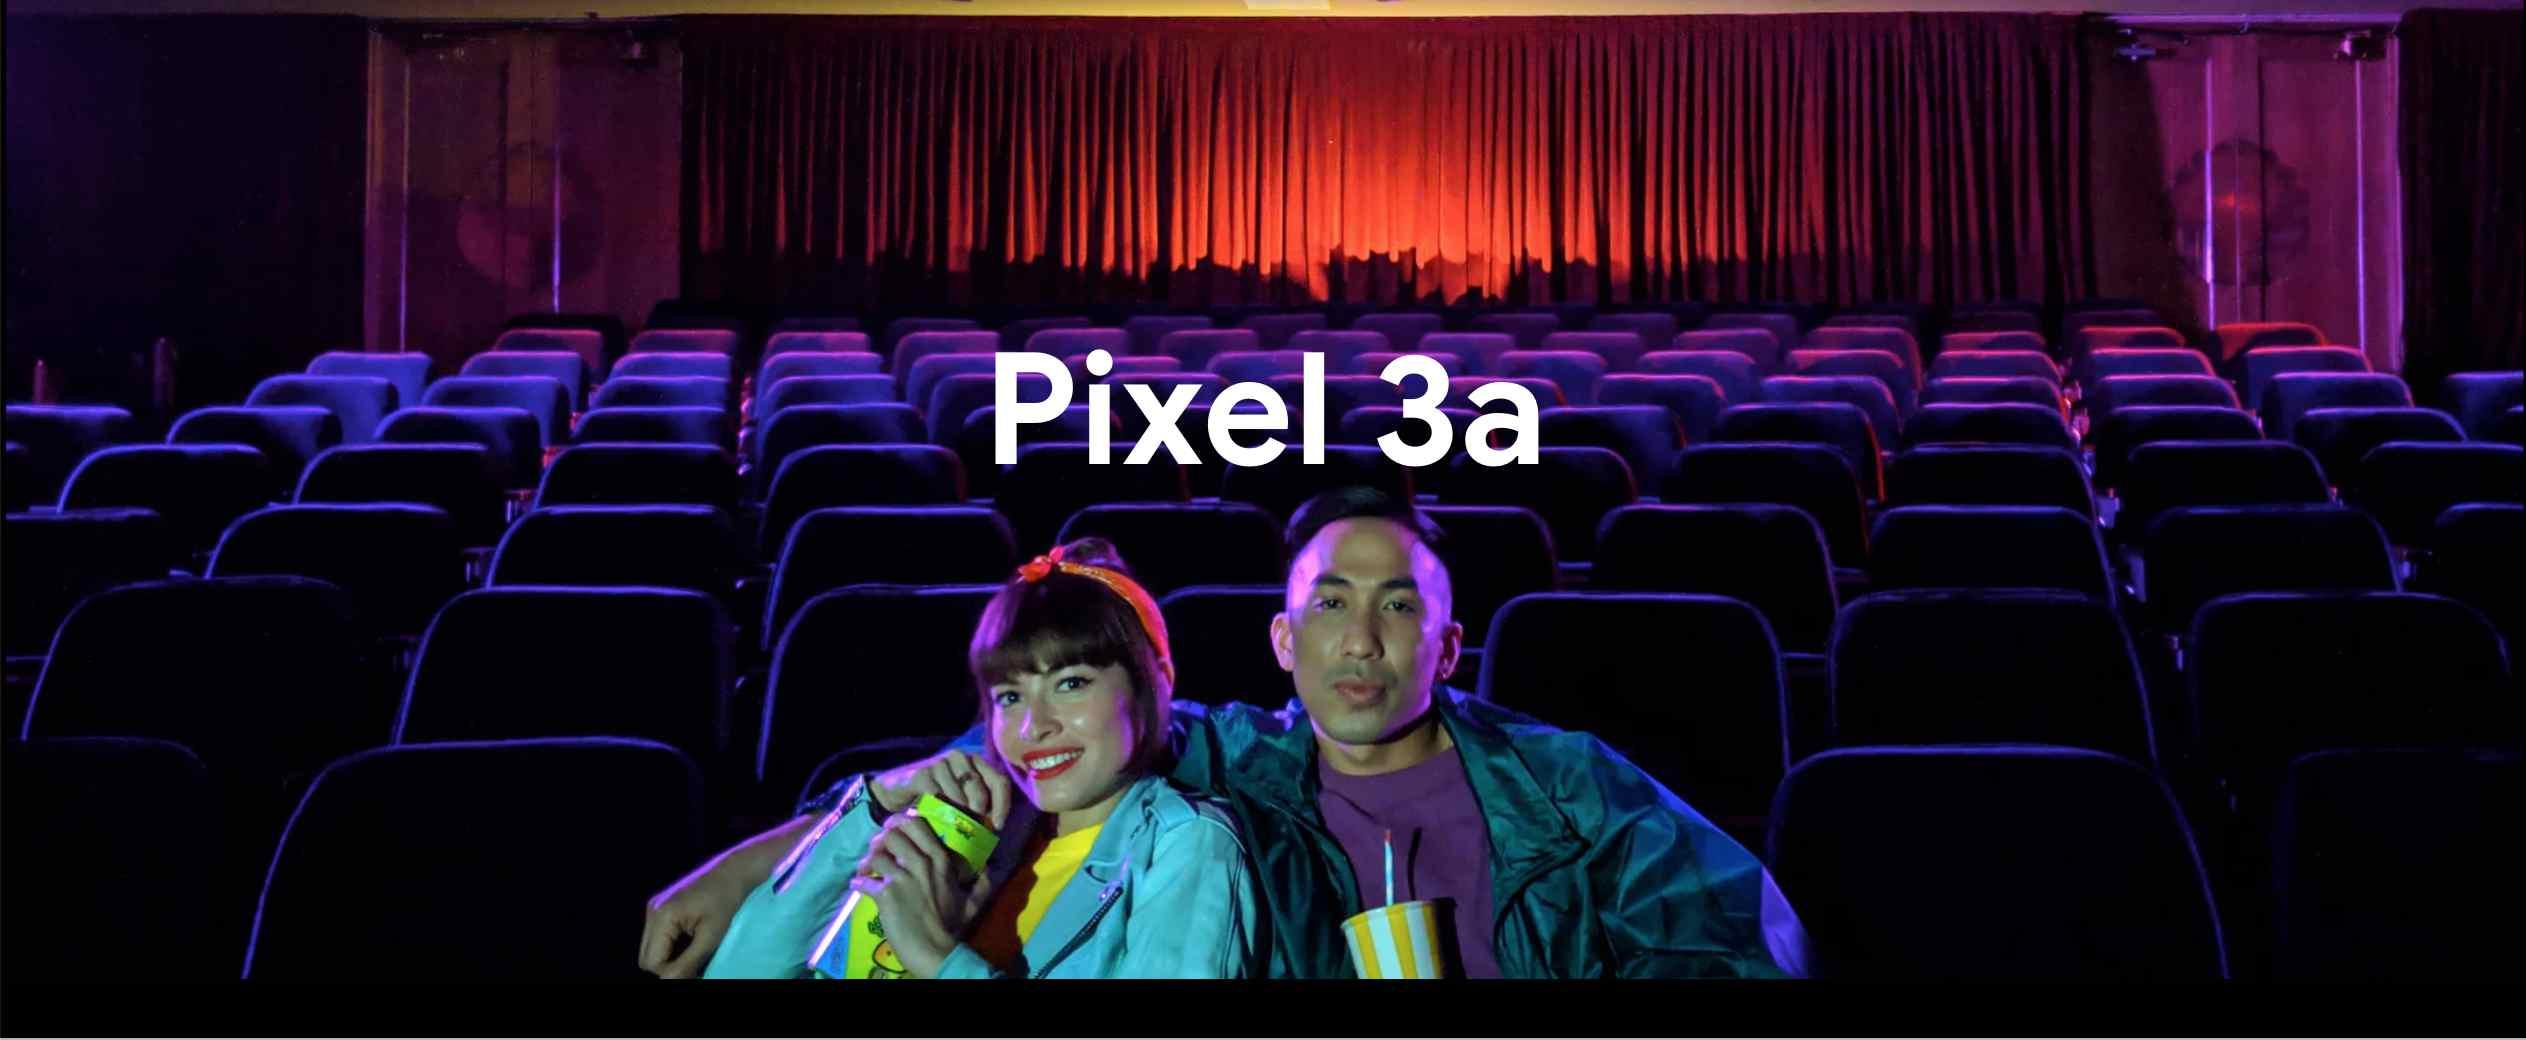 google pixel 3a singapore